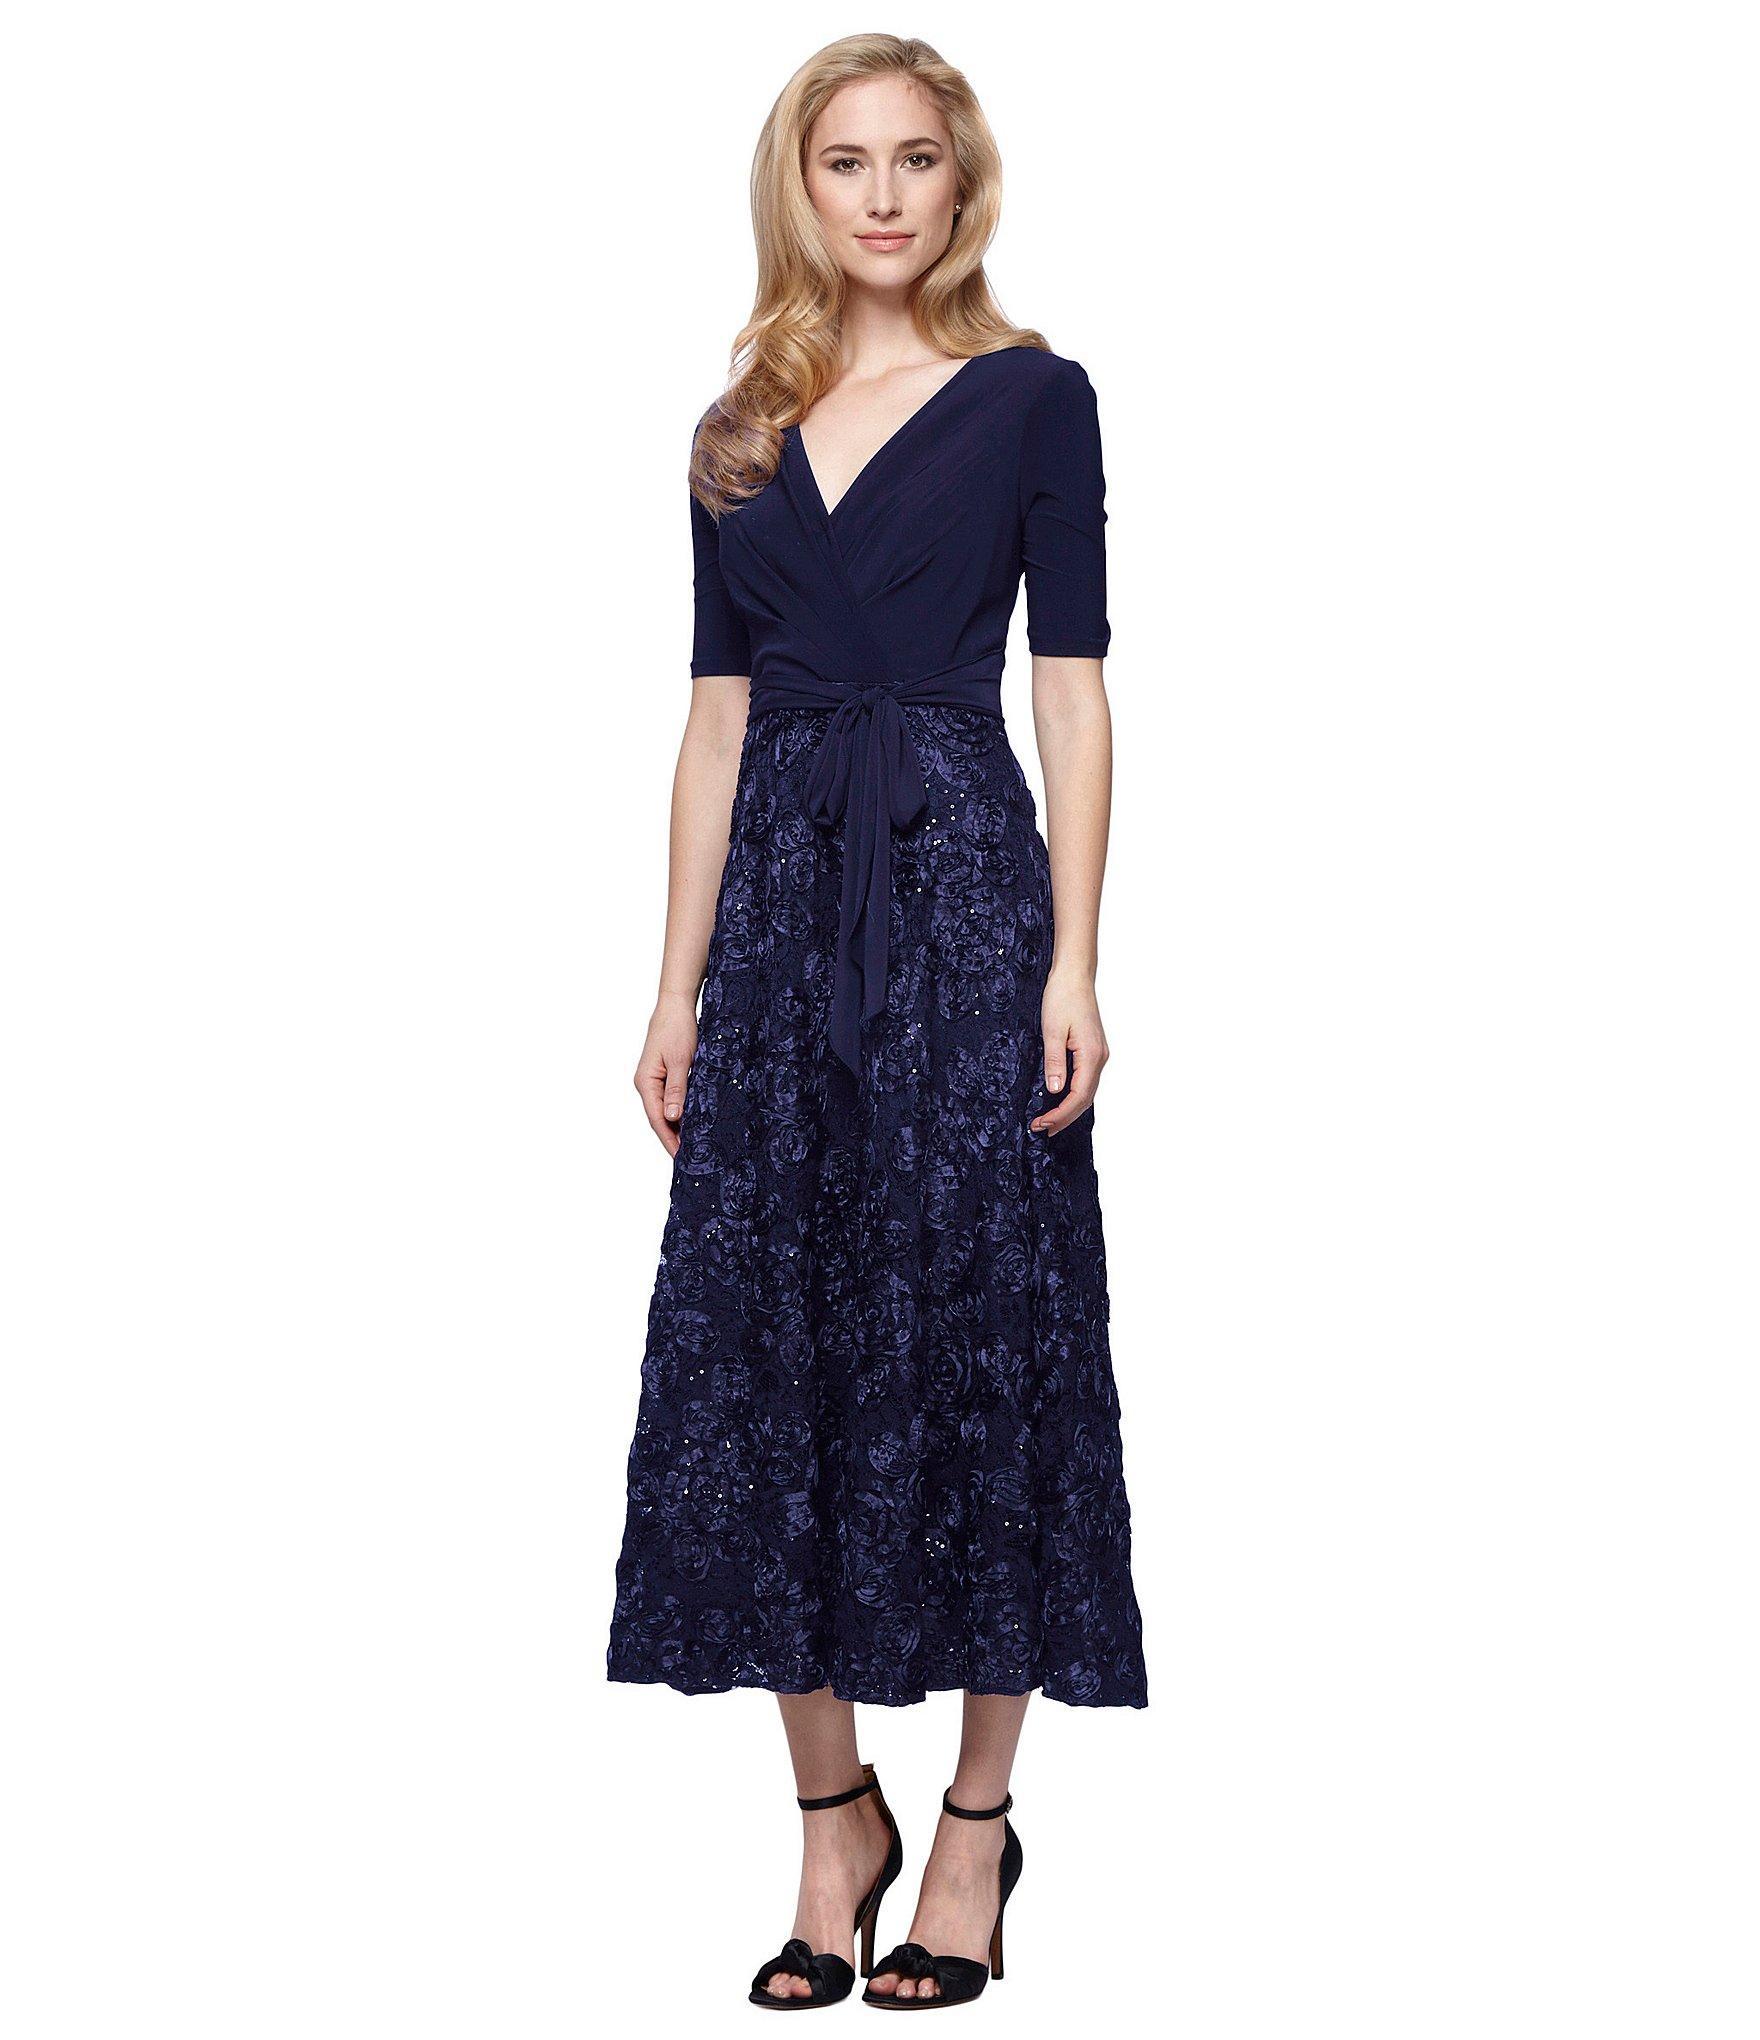 c9f393dc6d Lyst - Alex Evenings Tea-length Rosette Skirt Party Dress in Blue